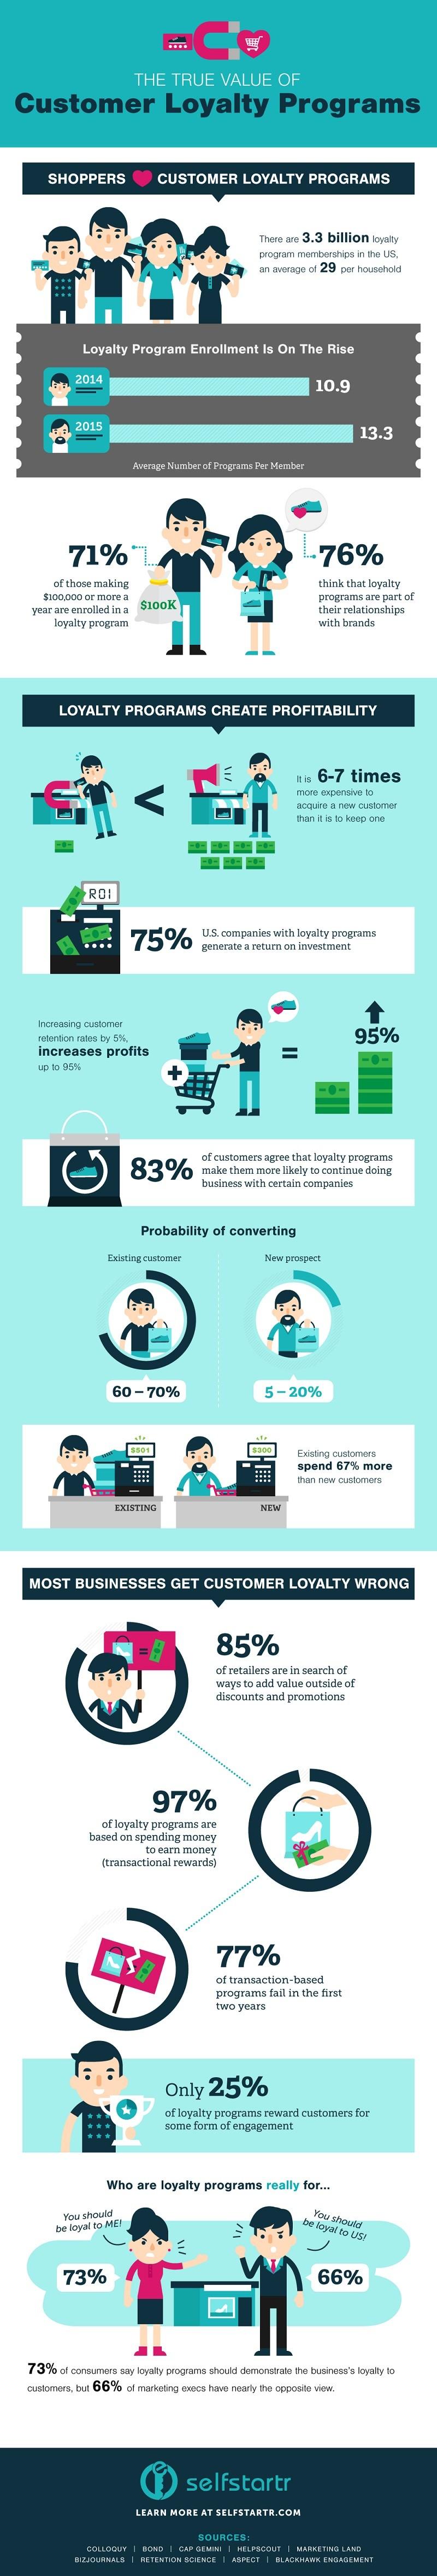 customer-loyalty-programs-infographic.jpg